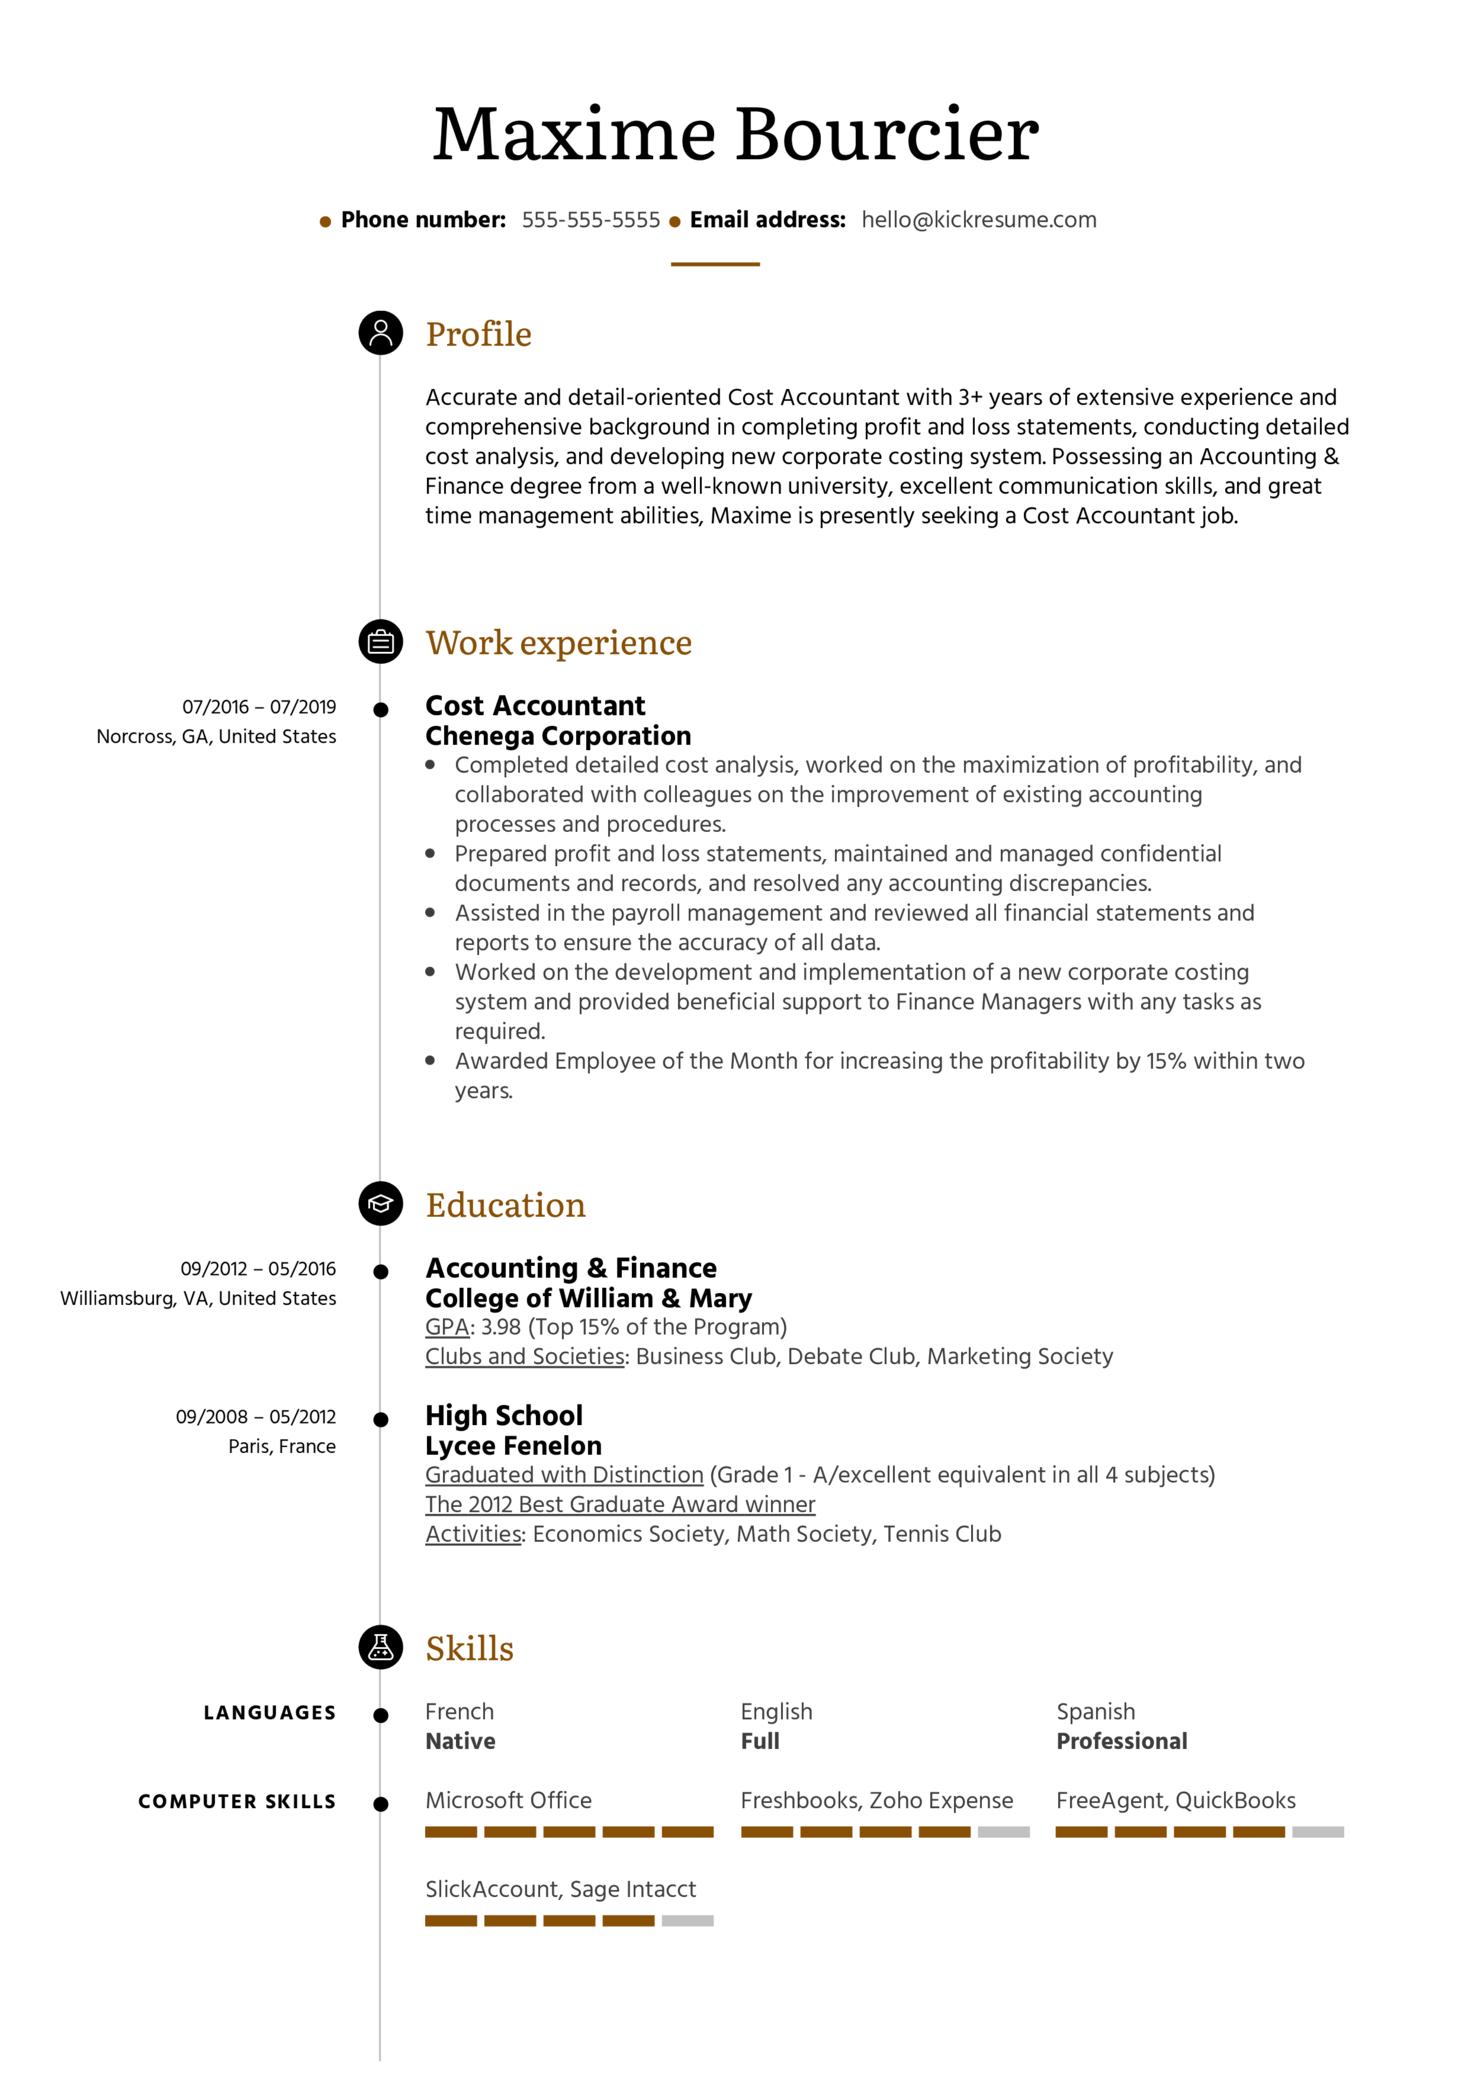 Cost Accountant Resume Example (časť 1)